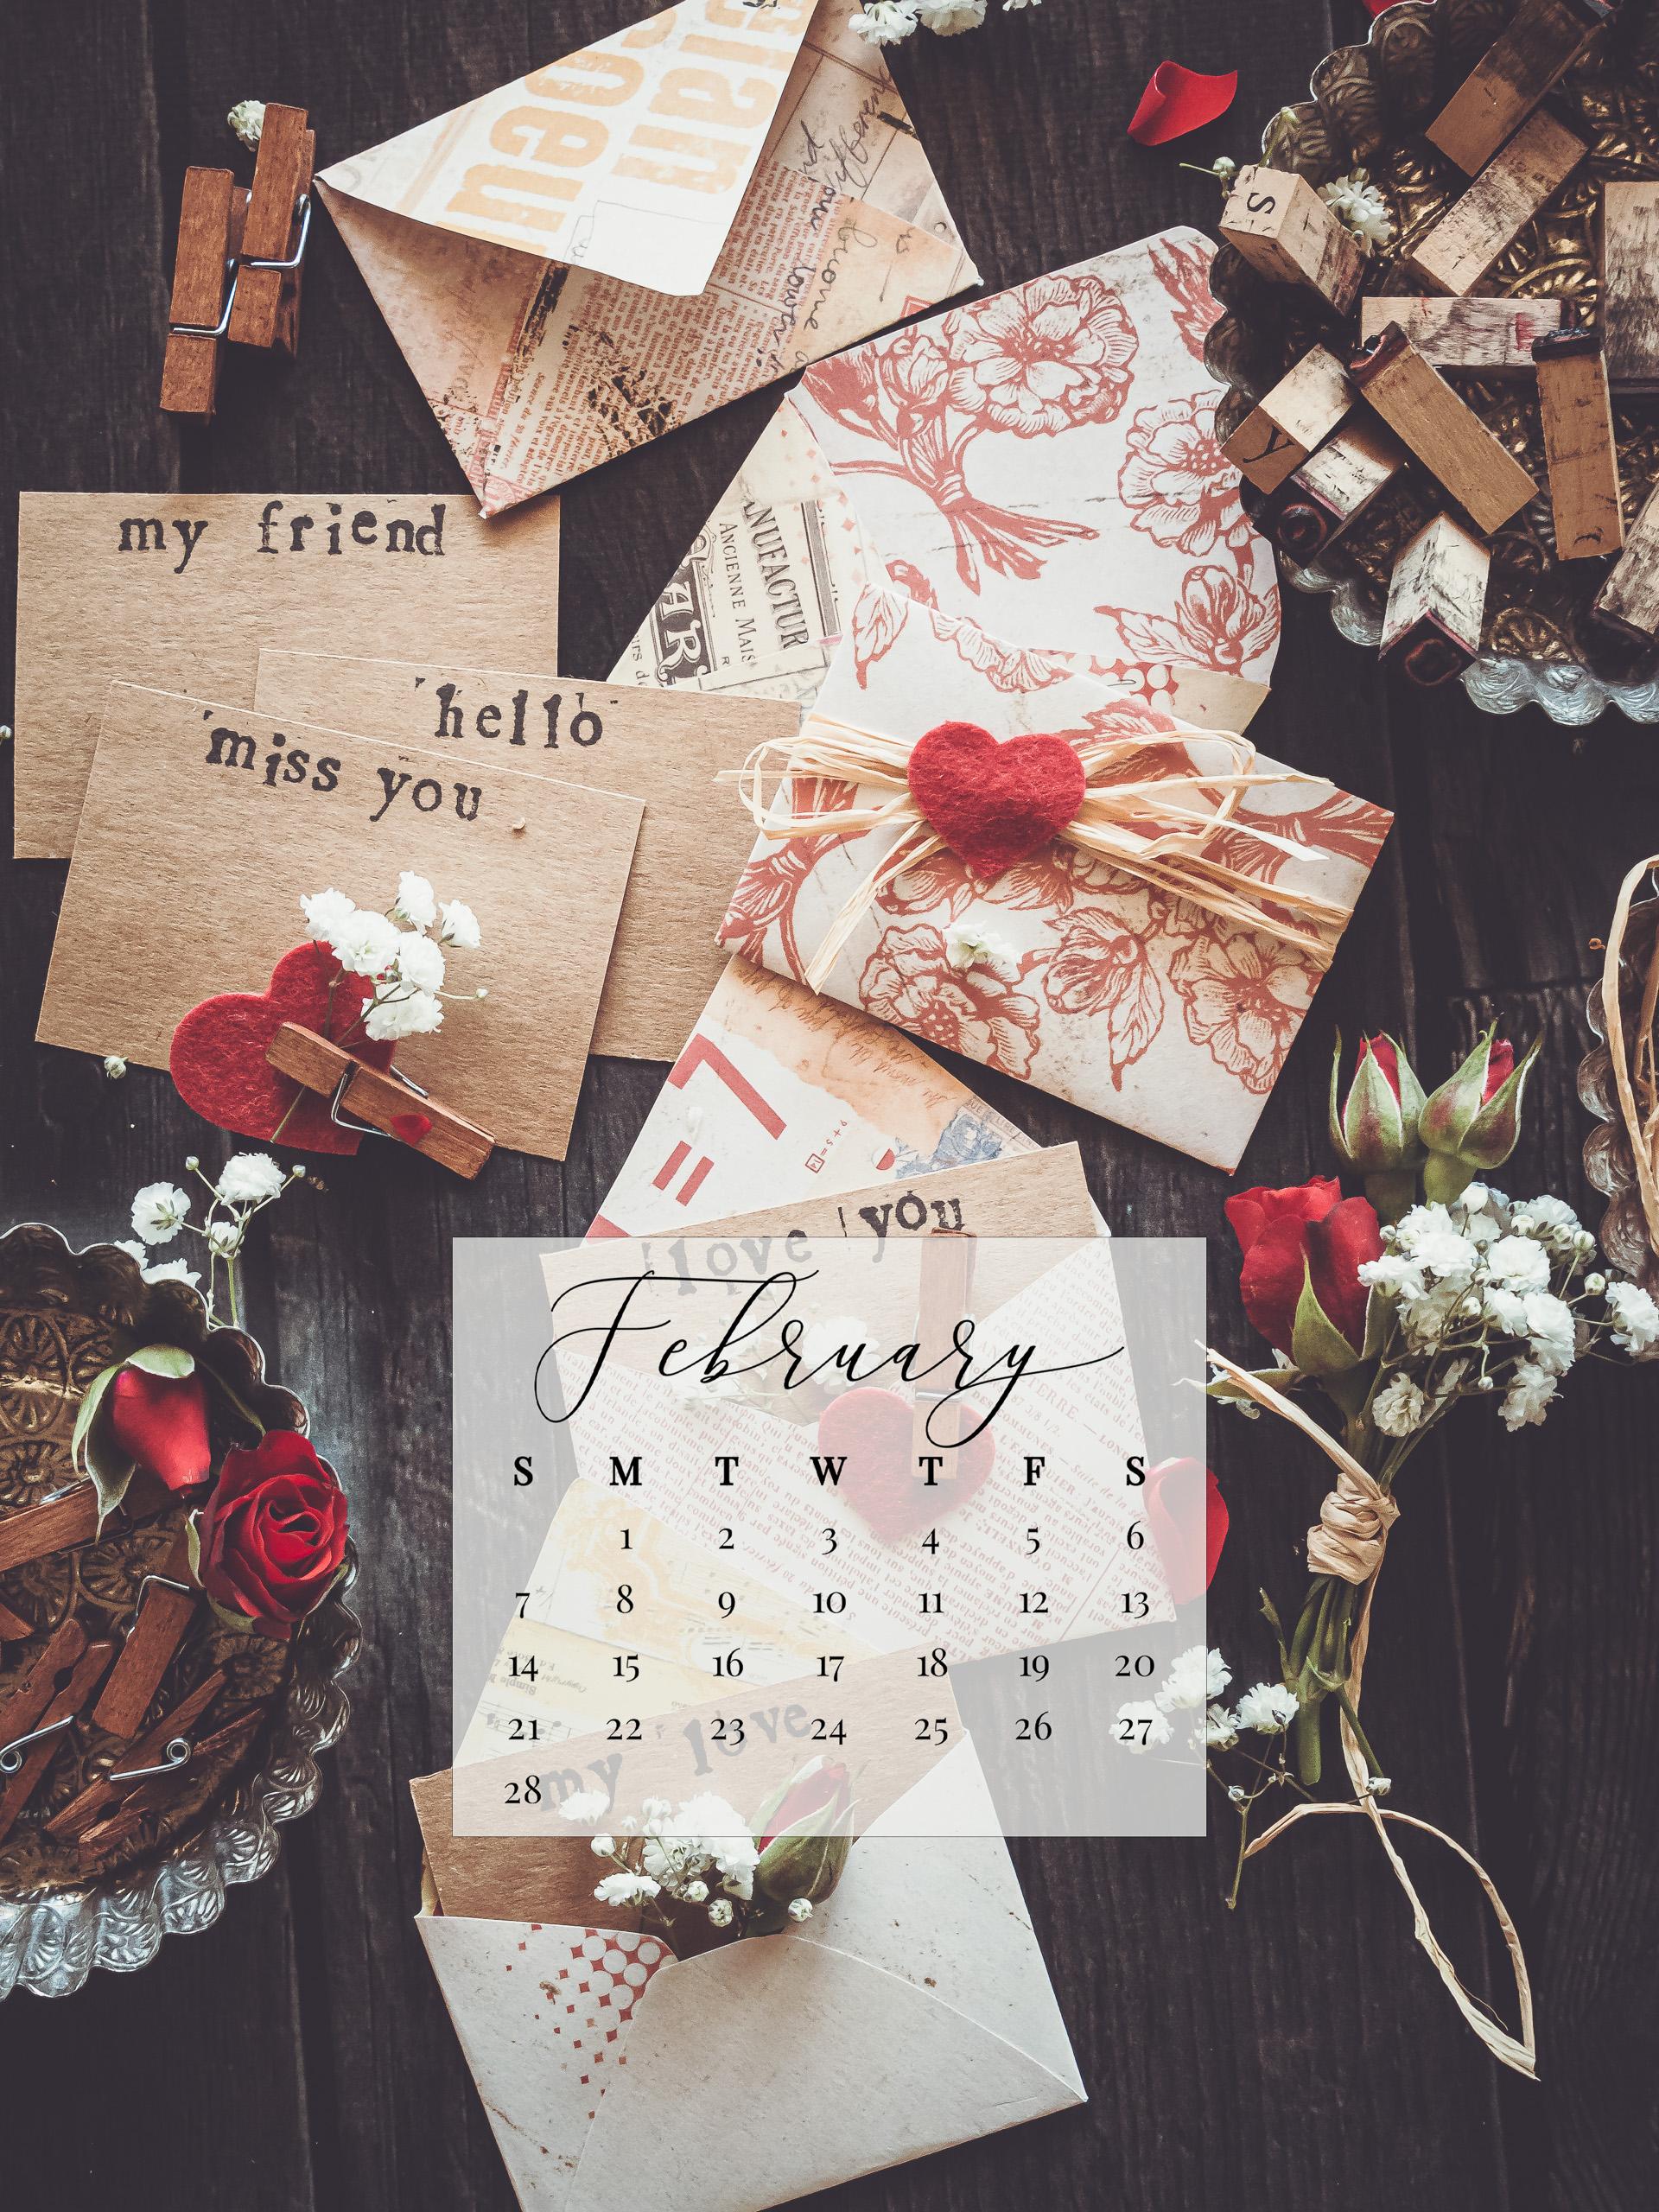 February 2021 Device Calendar